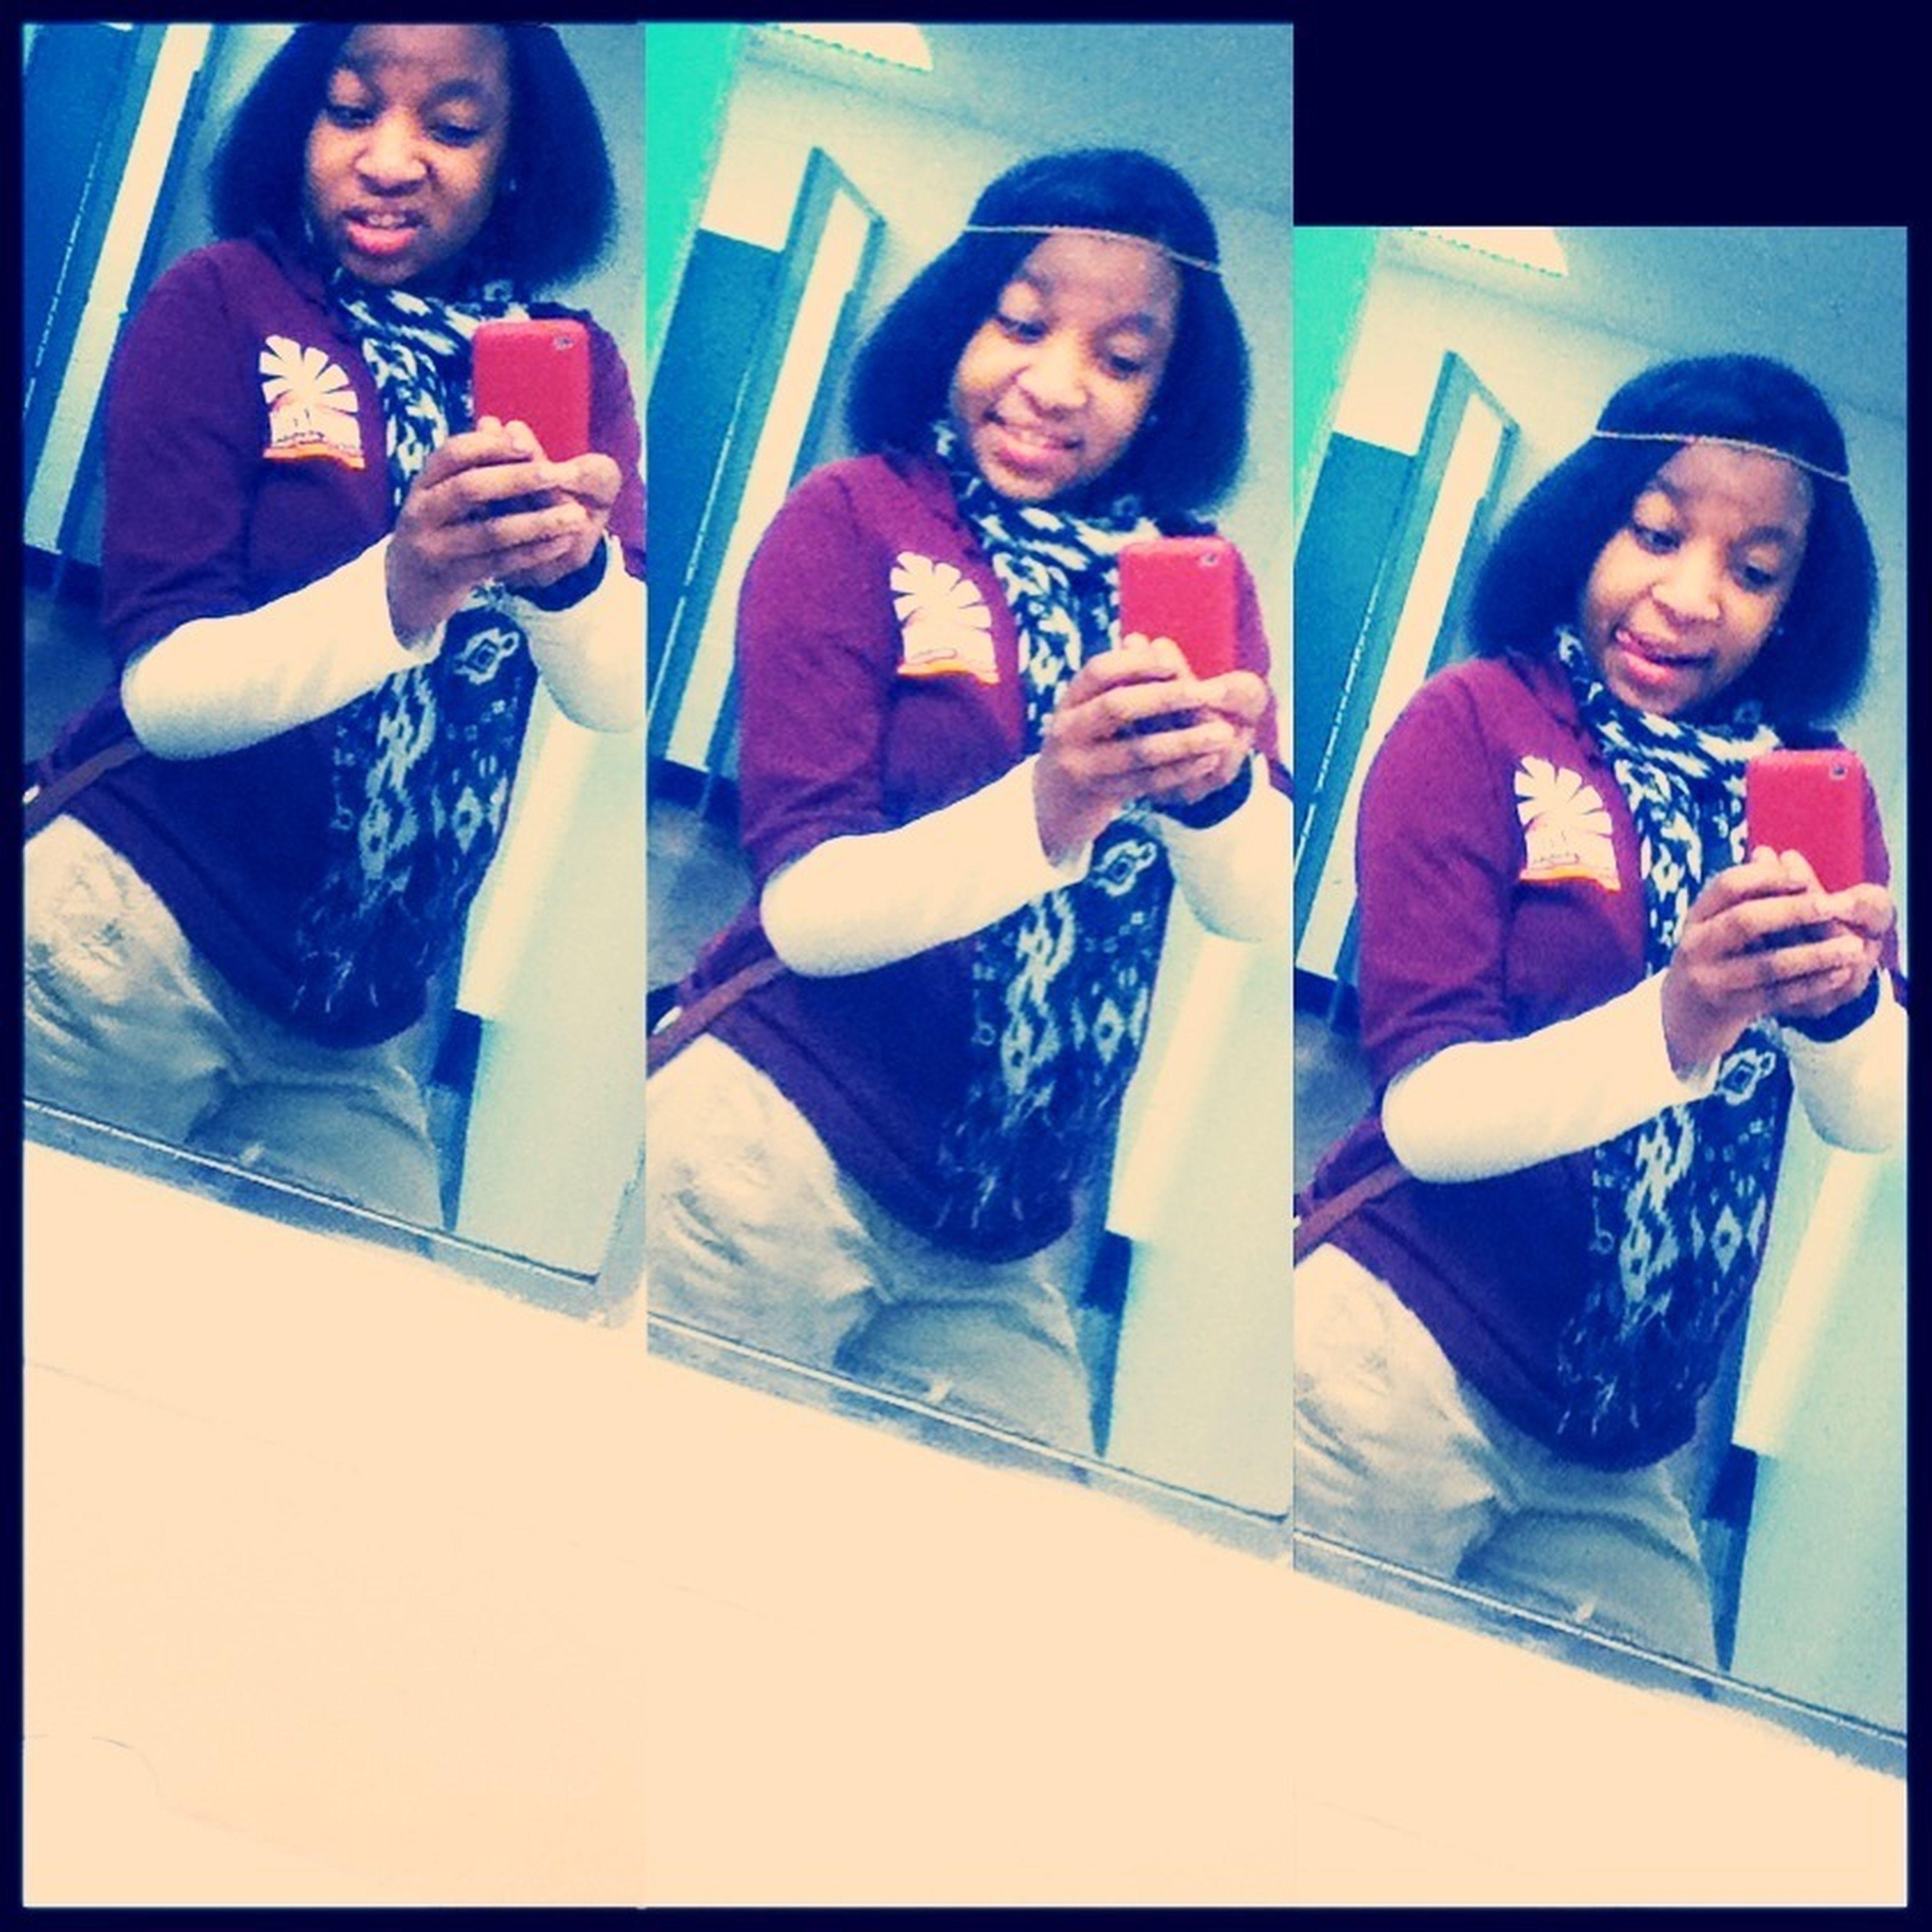 At School Thuggin !